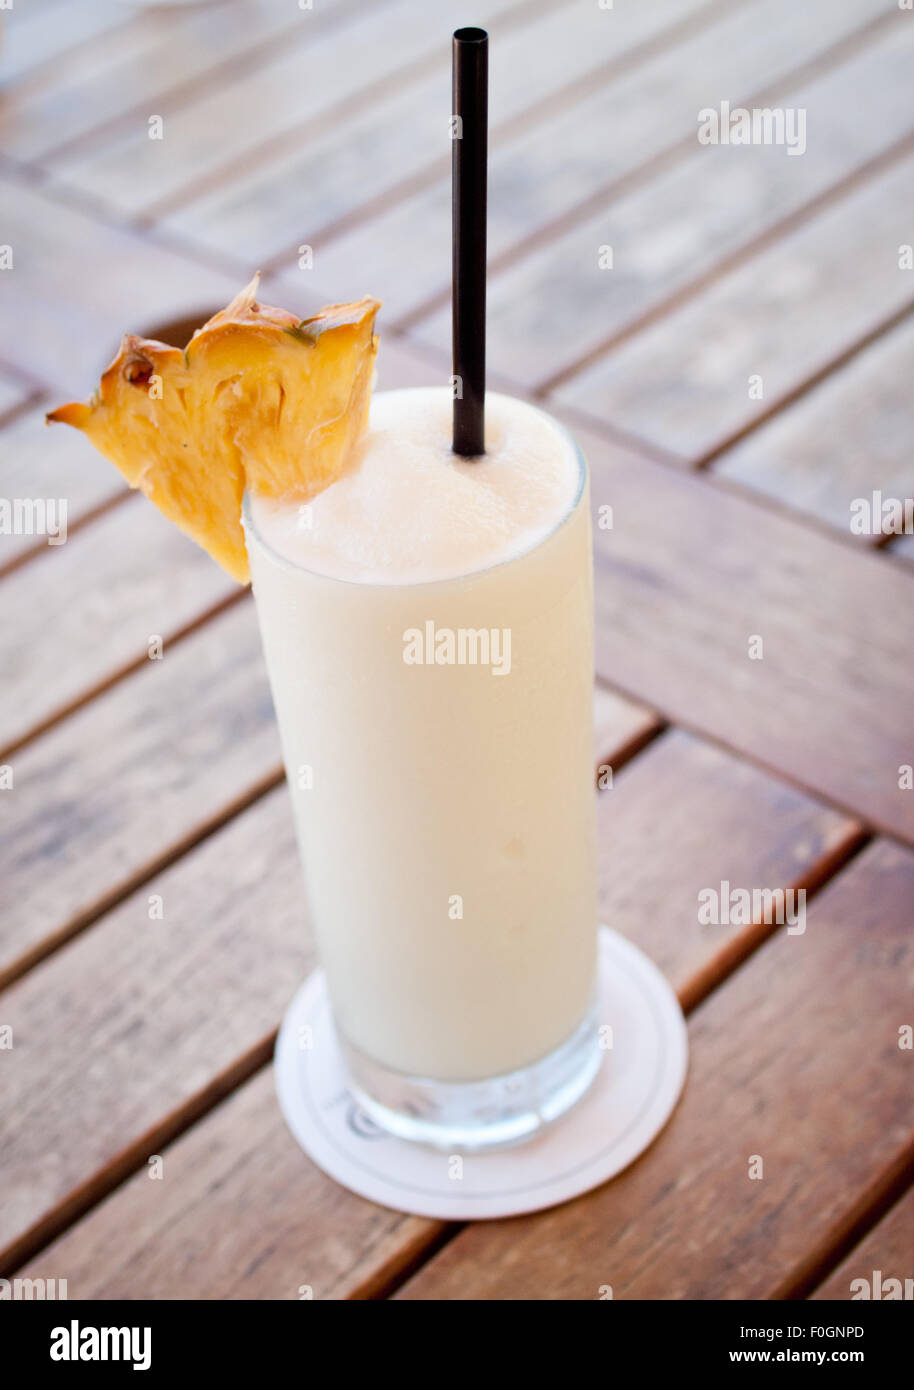 Eine Piña Colada (Pina Colada) cocktail. Stockbild